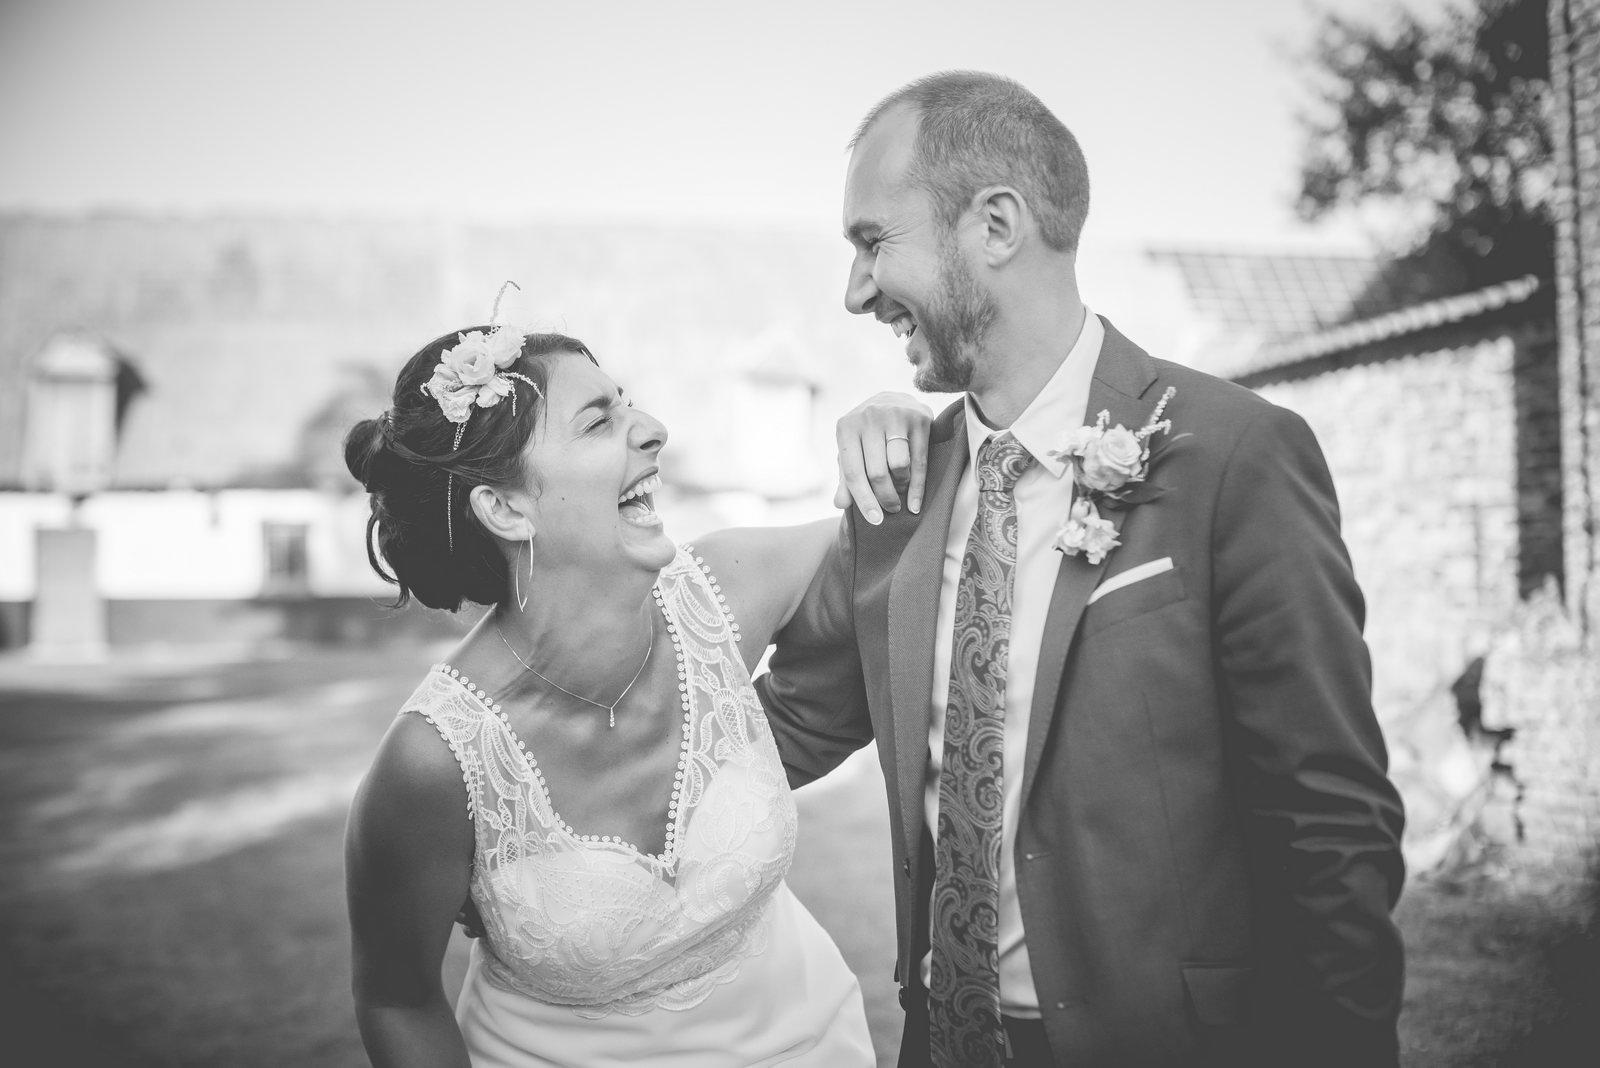 Mariage à l'abbaye de Clairmarais - photographe mariage